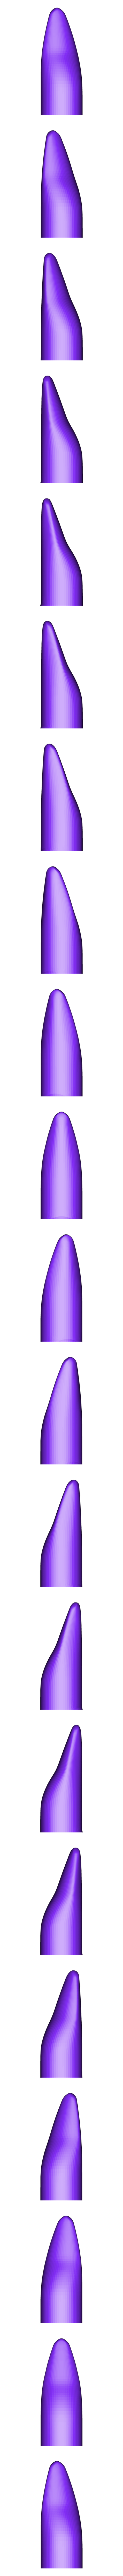 Nose.STL Download STL file Phenom 300 • Template to 3D print, Eduardohbm